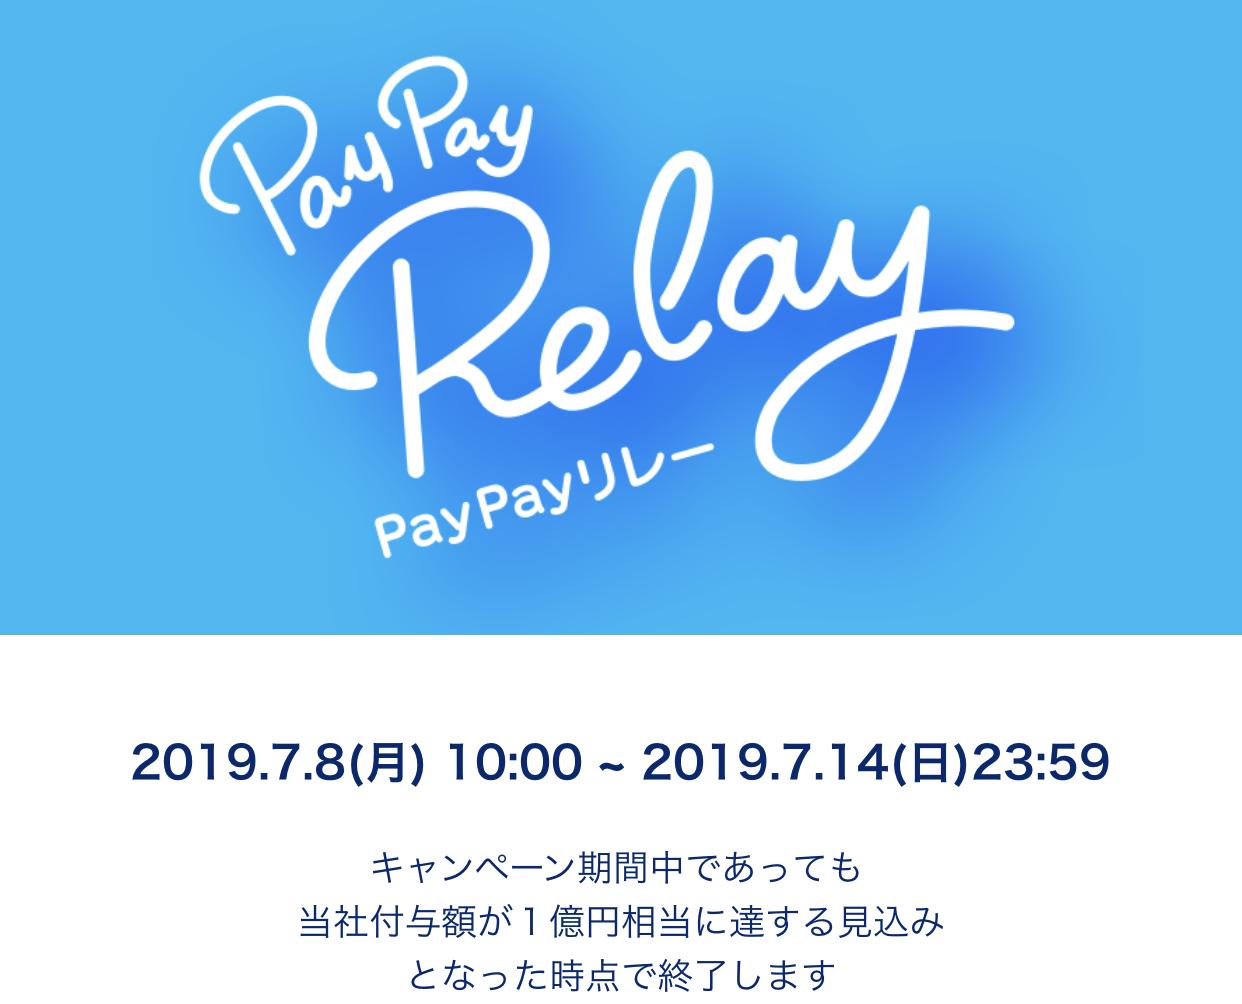 PayPayRelay 01